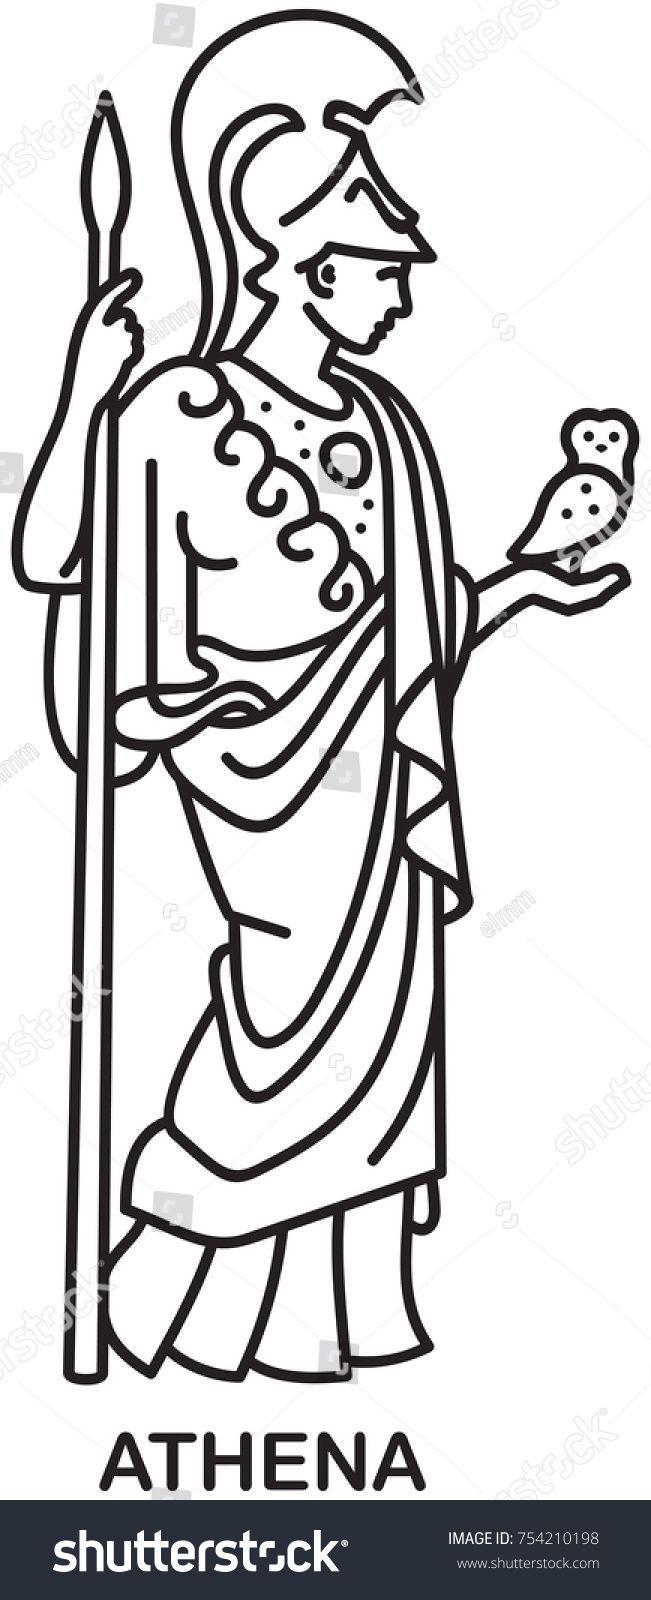 Athena Ancient Greek Goddess Of Wisdom Craft And War Line